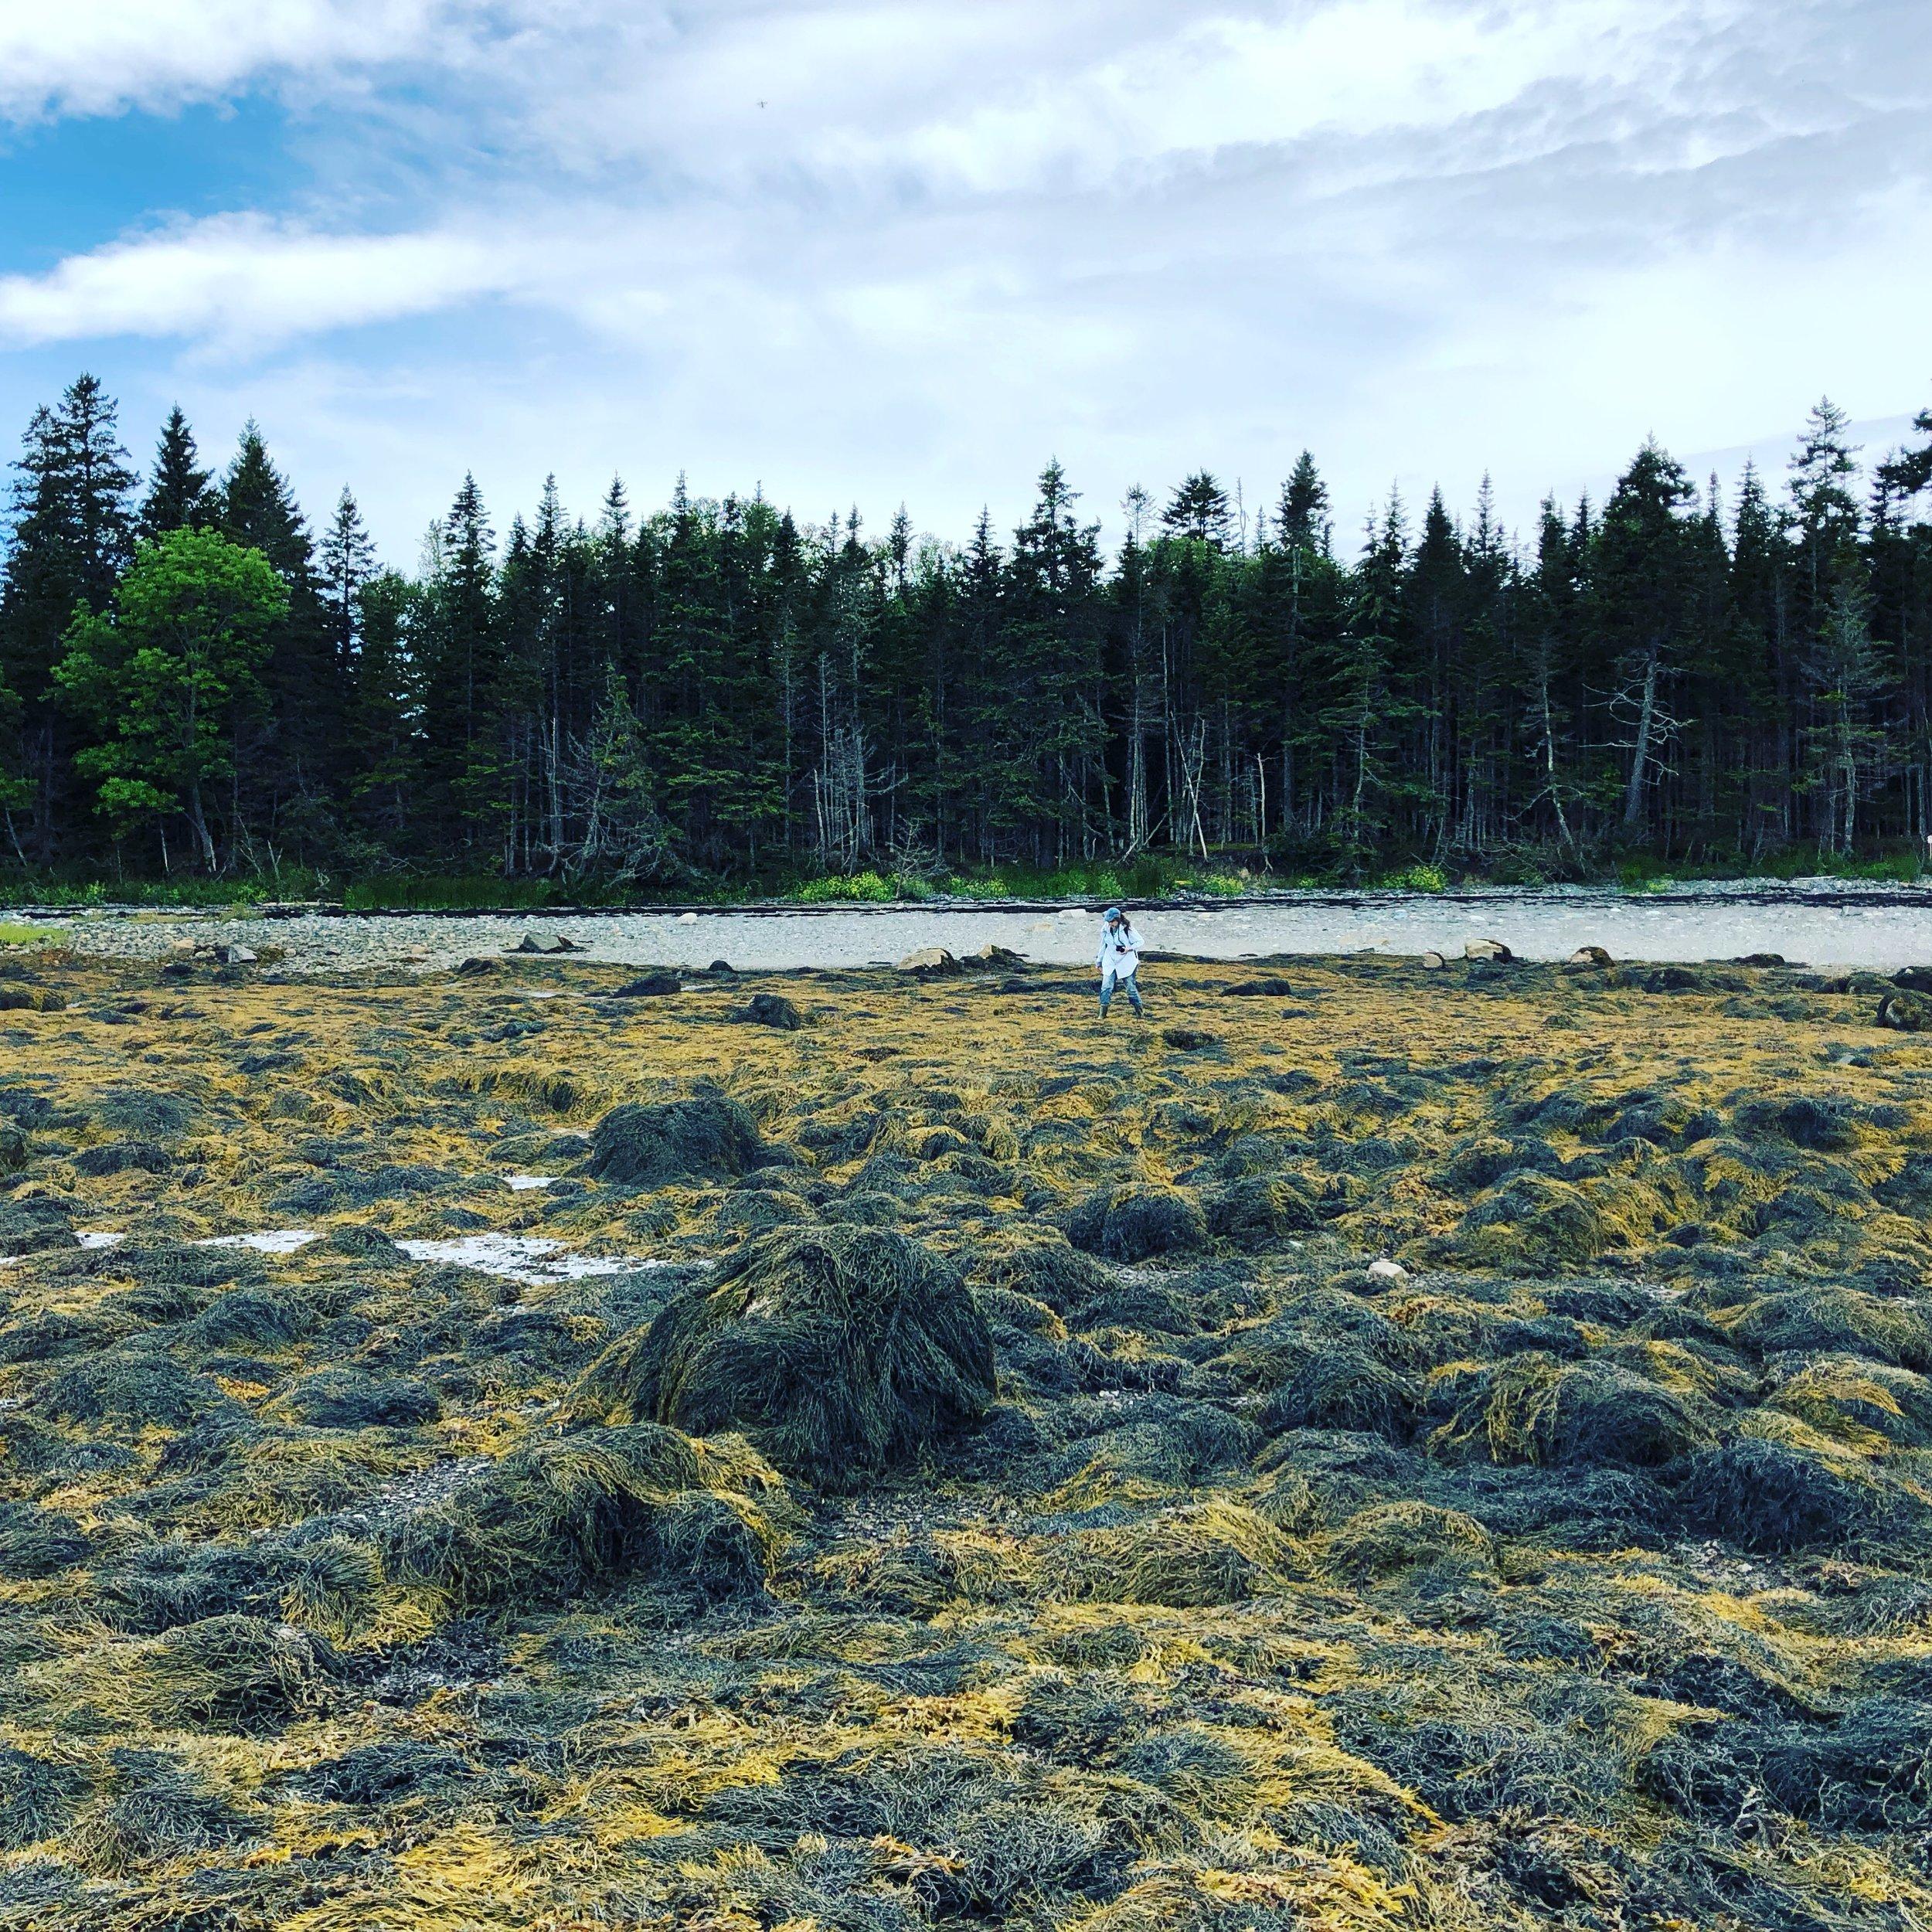 Roque Bluffs rockweed